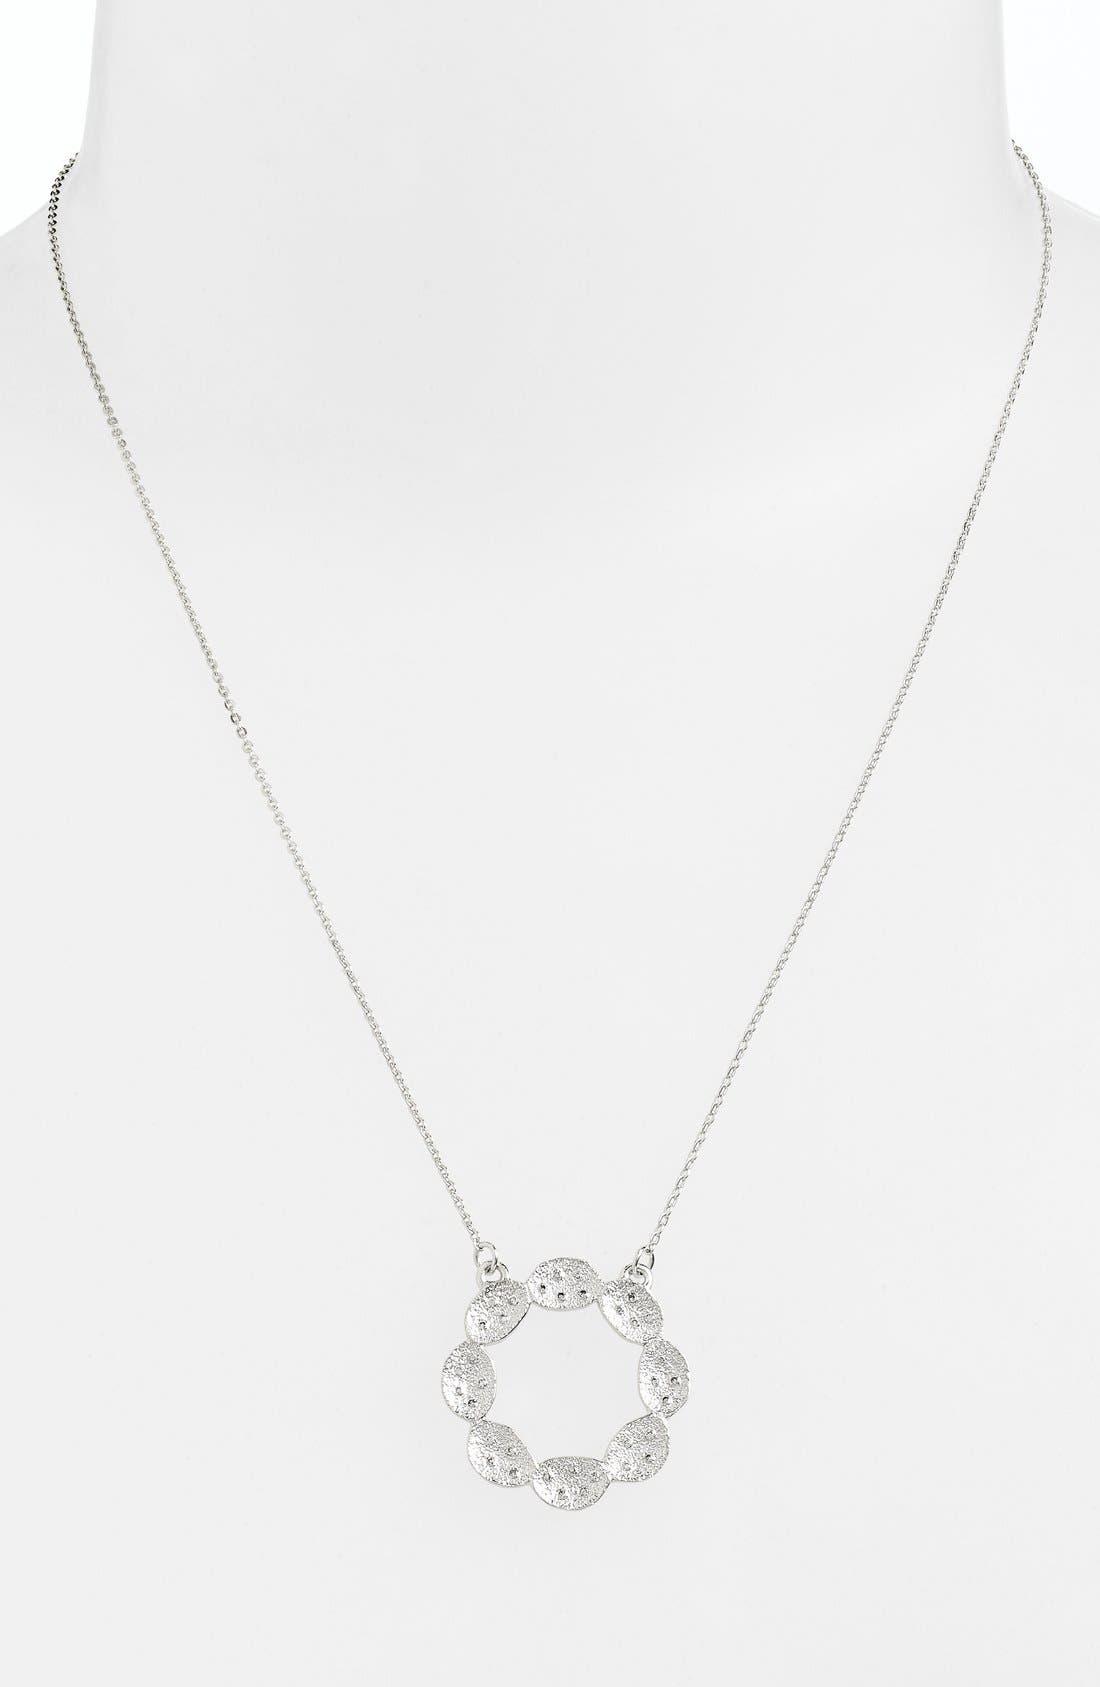 'Ashley' Pod Pendant Necklace,                             Main thumbnail 1, color,                             Silver/ Clear